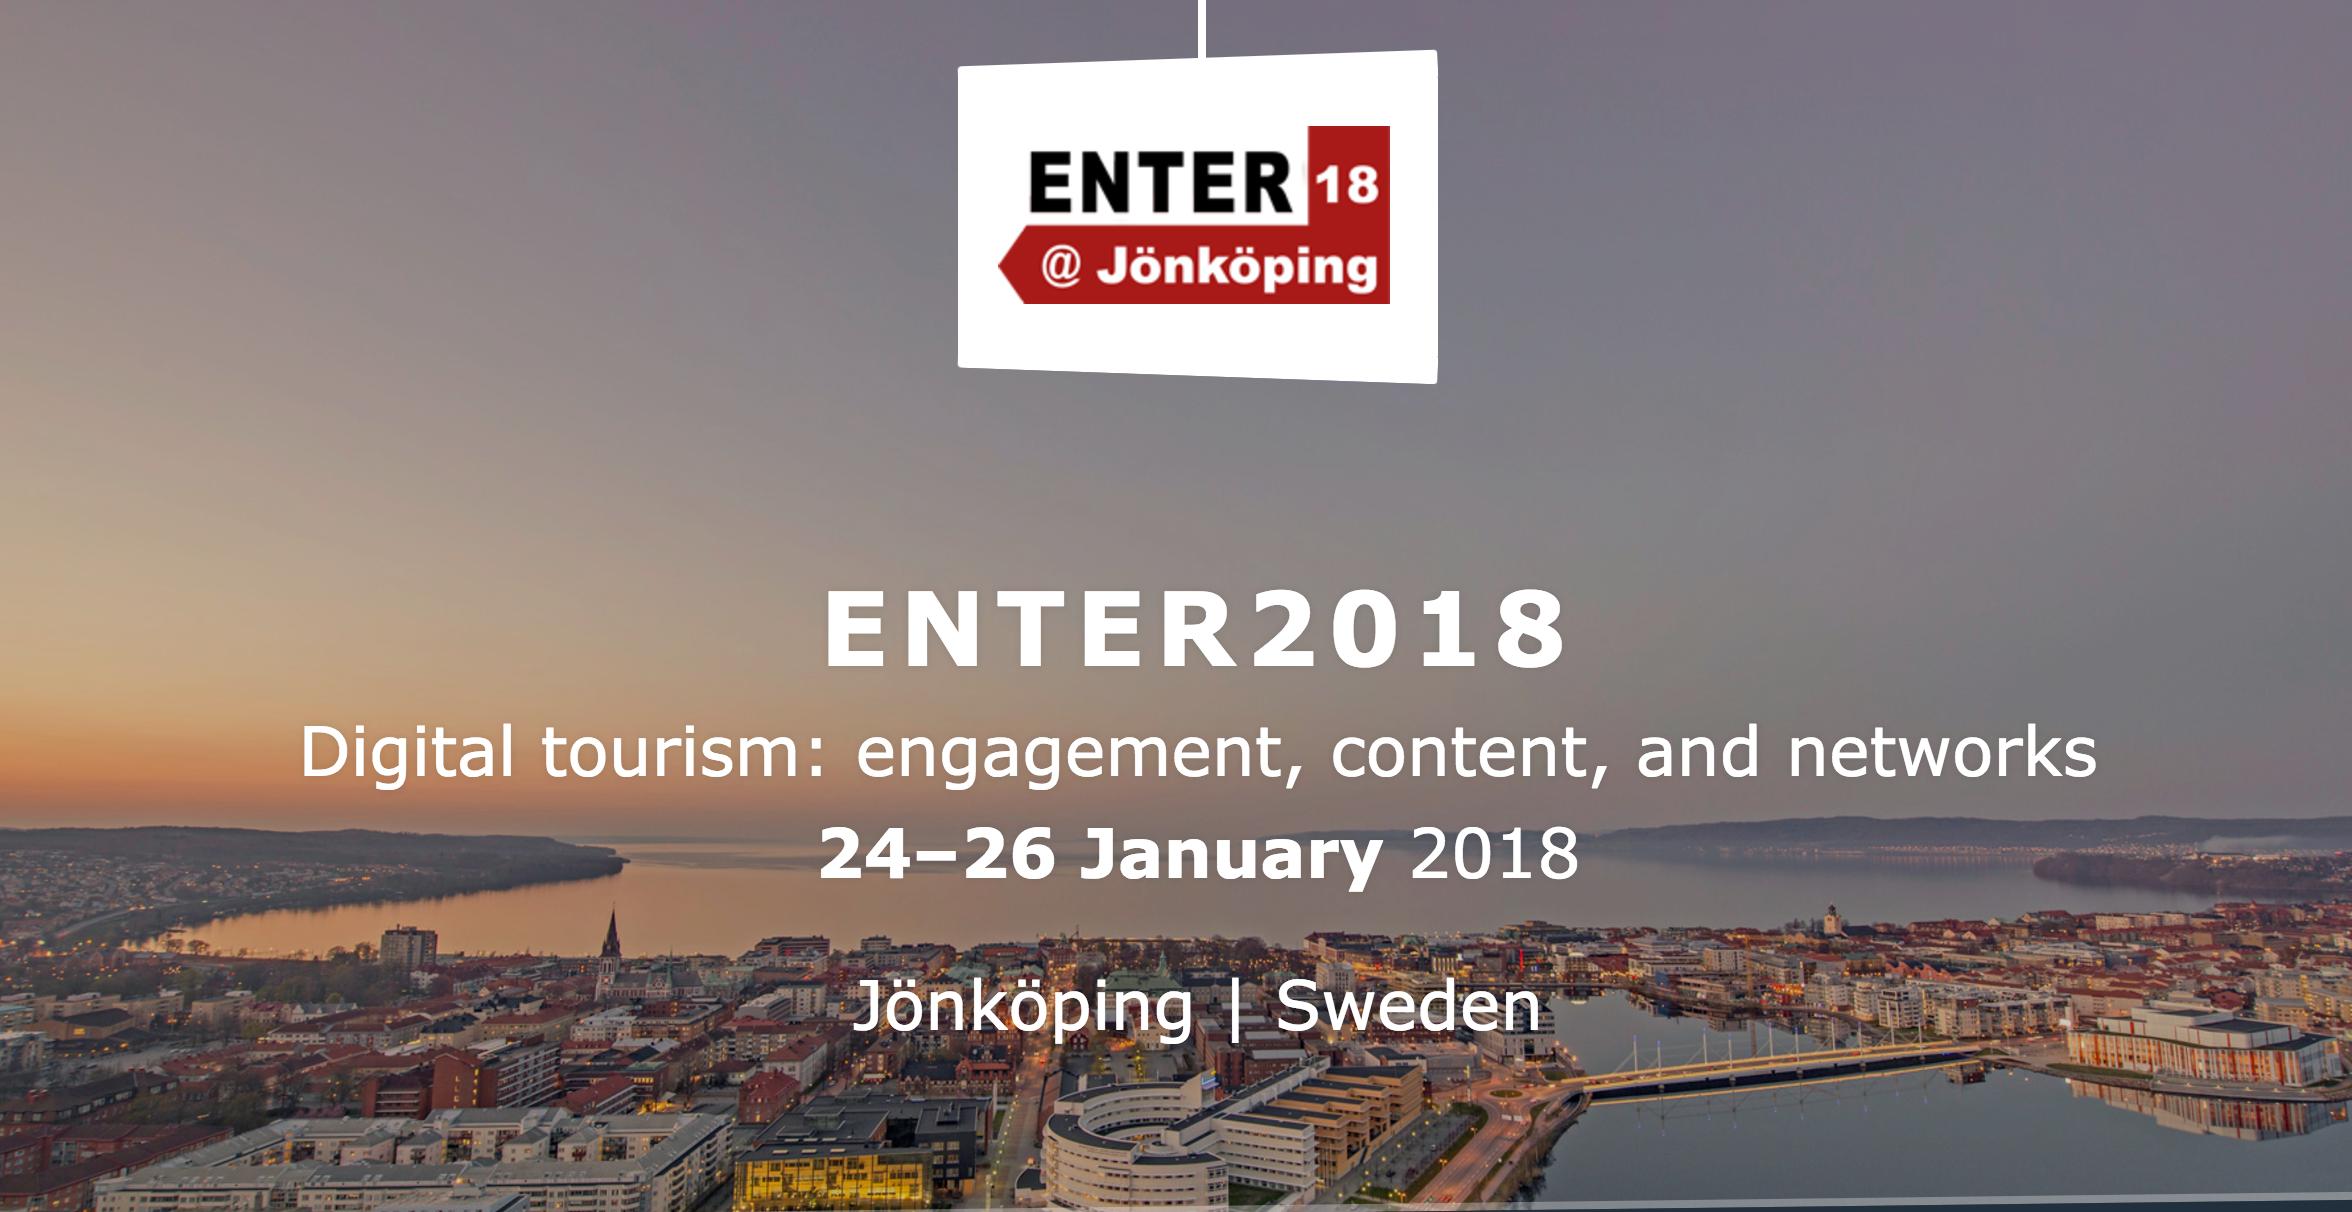 IFITT's ICT4D Scholarship to attend ENTER2018 eTourism Conference in Jönköping, Sweden